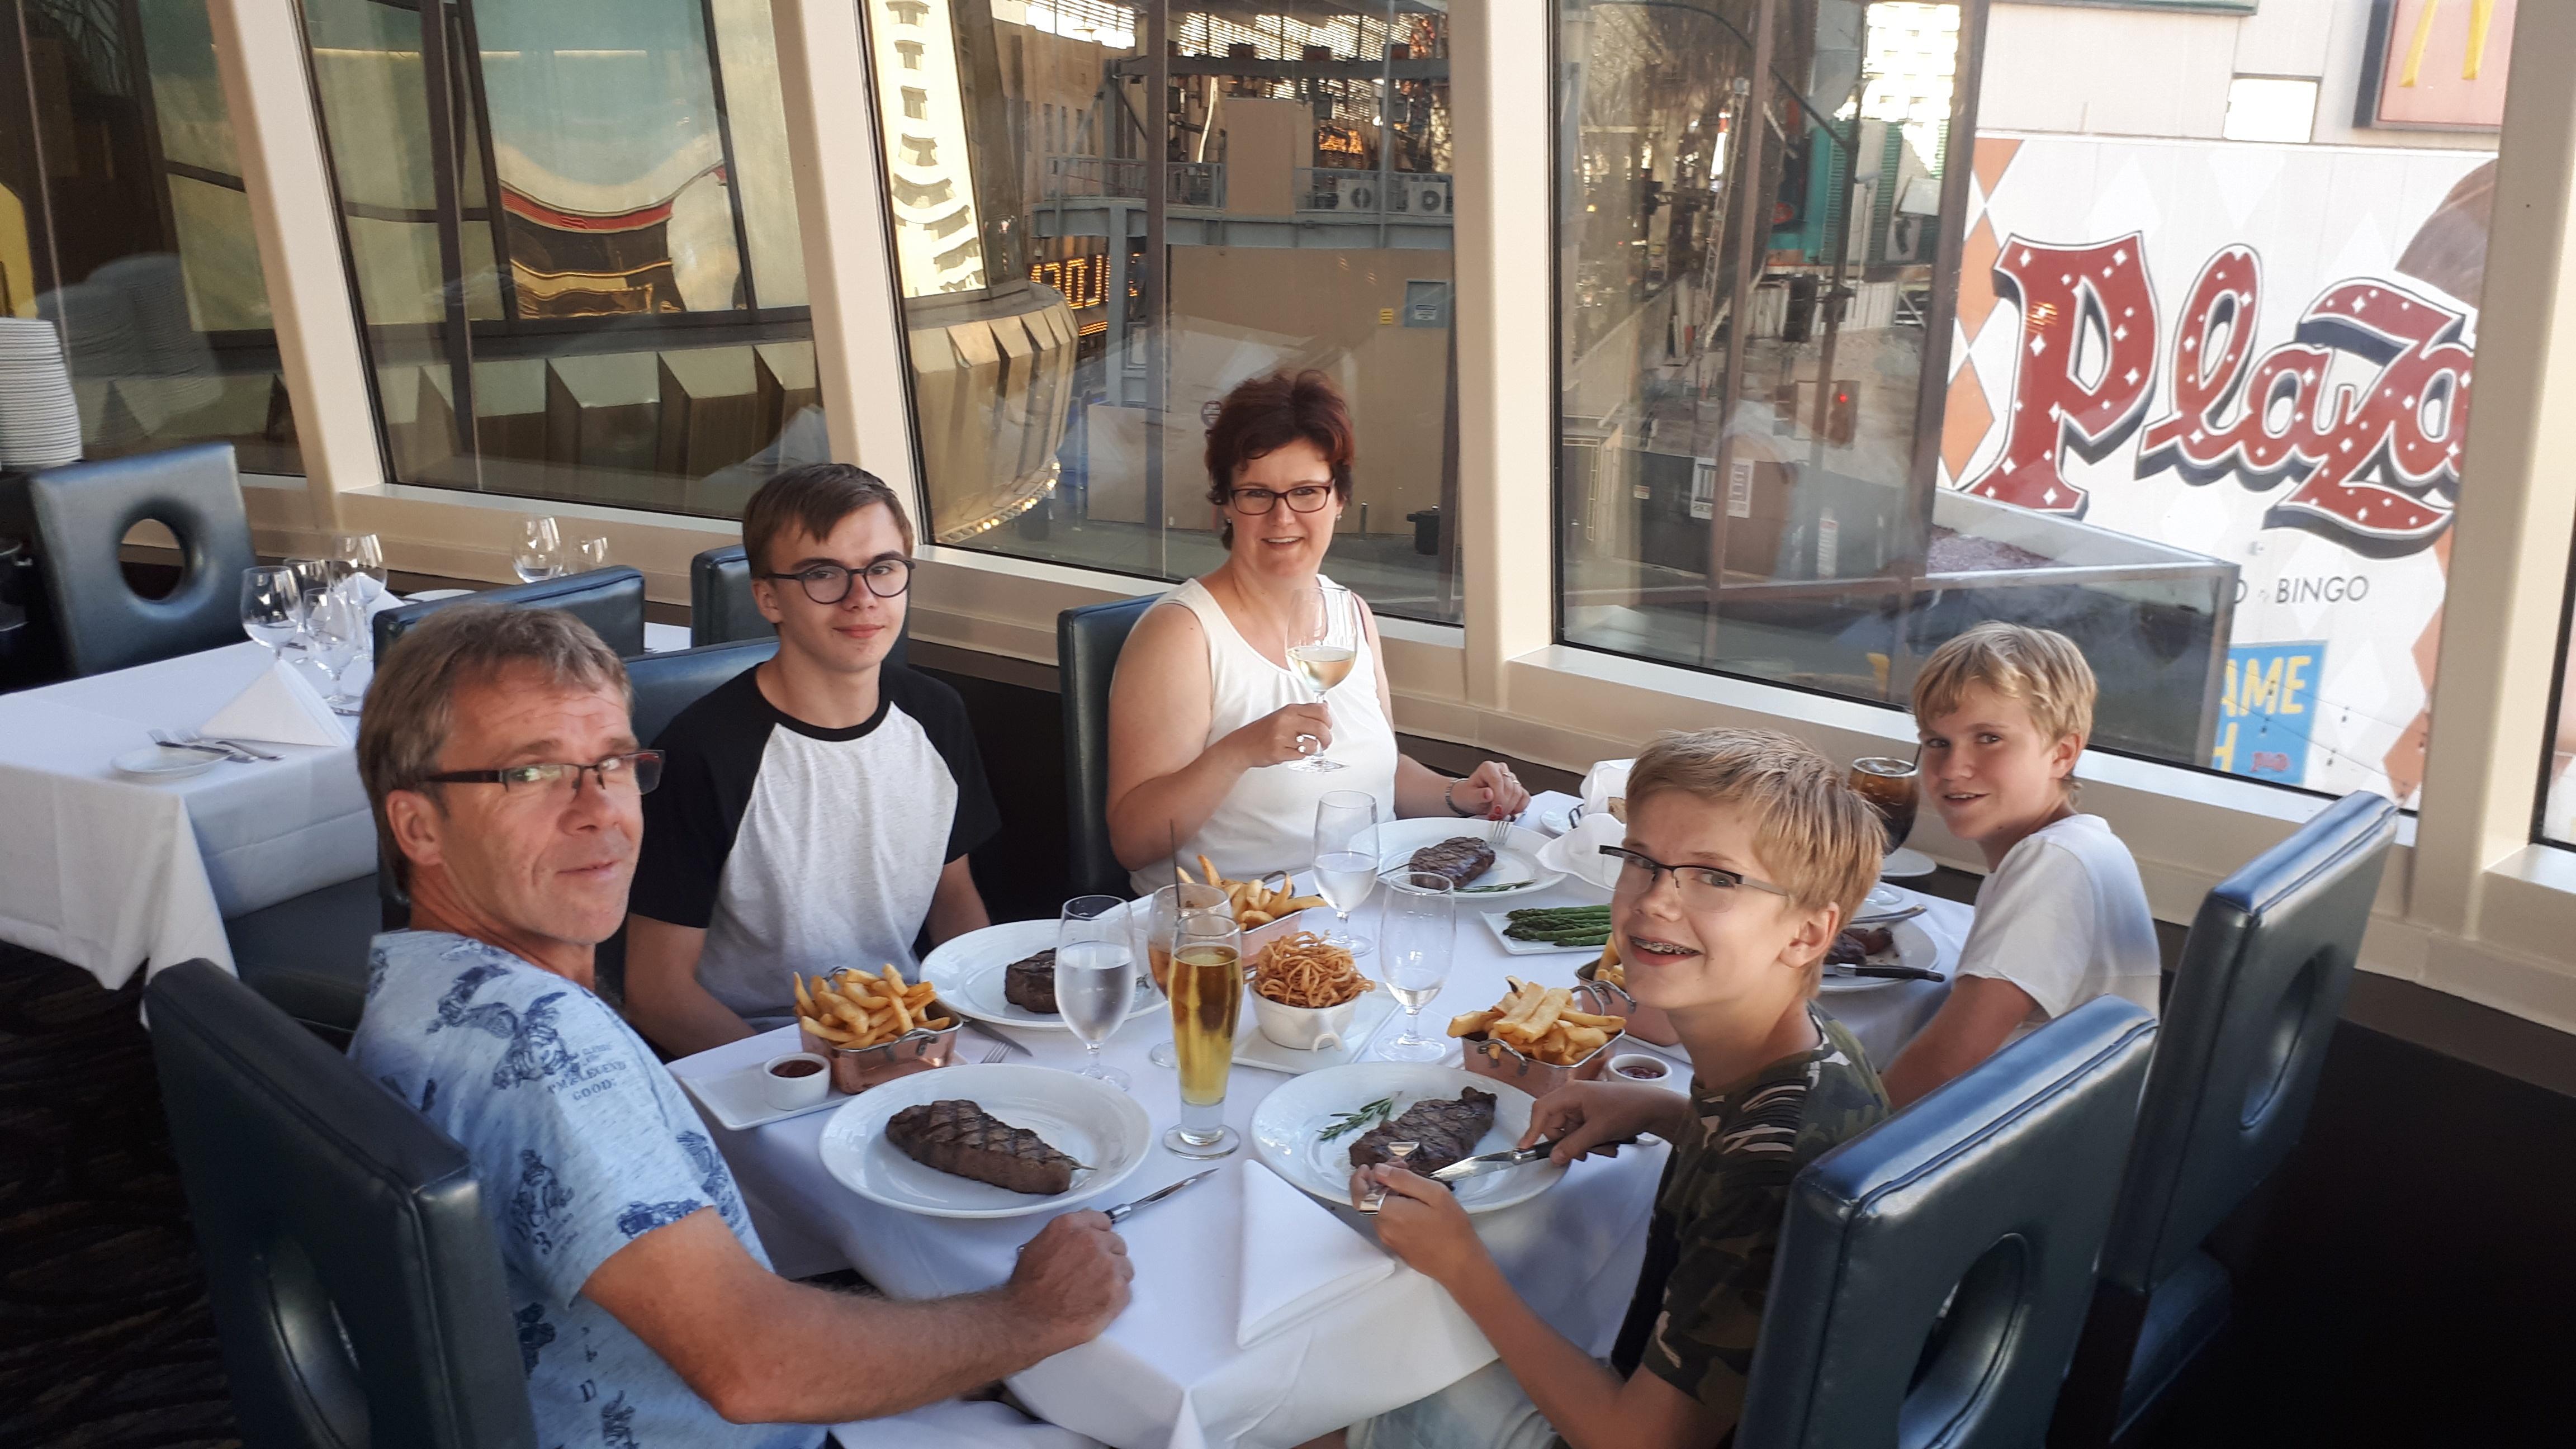 Reisverslagen Amerika: Wendy maakte een rondreis in West-Amerika (deel 1 van 2)